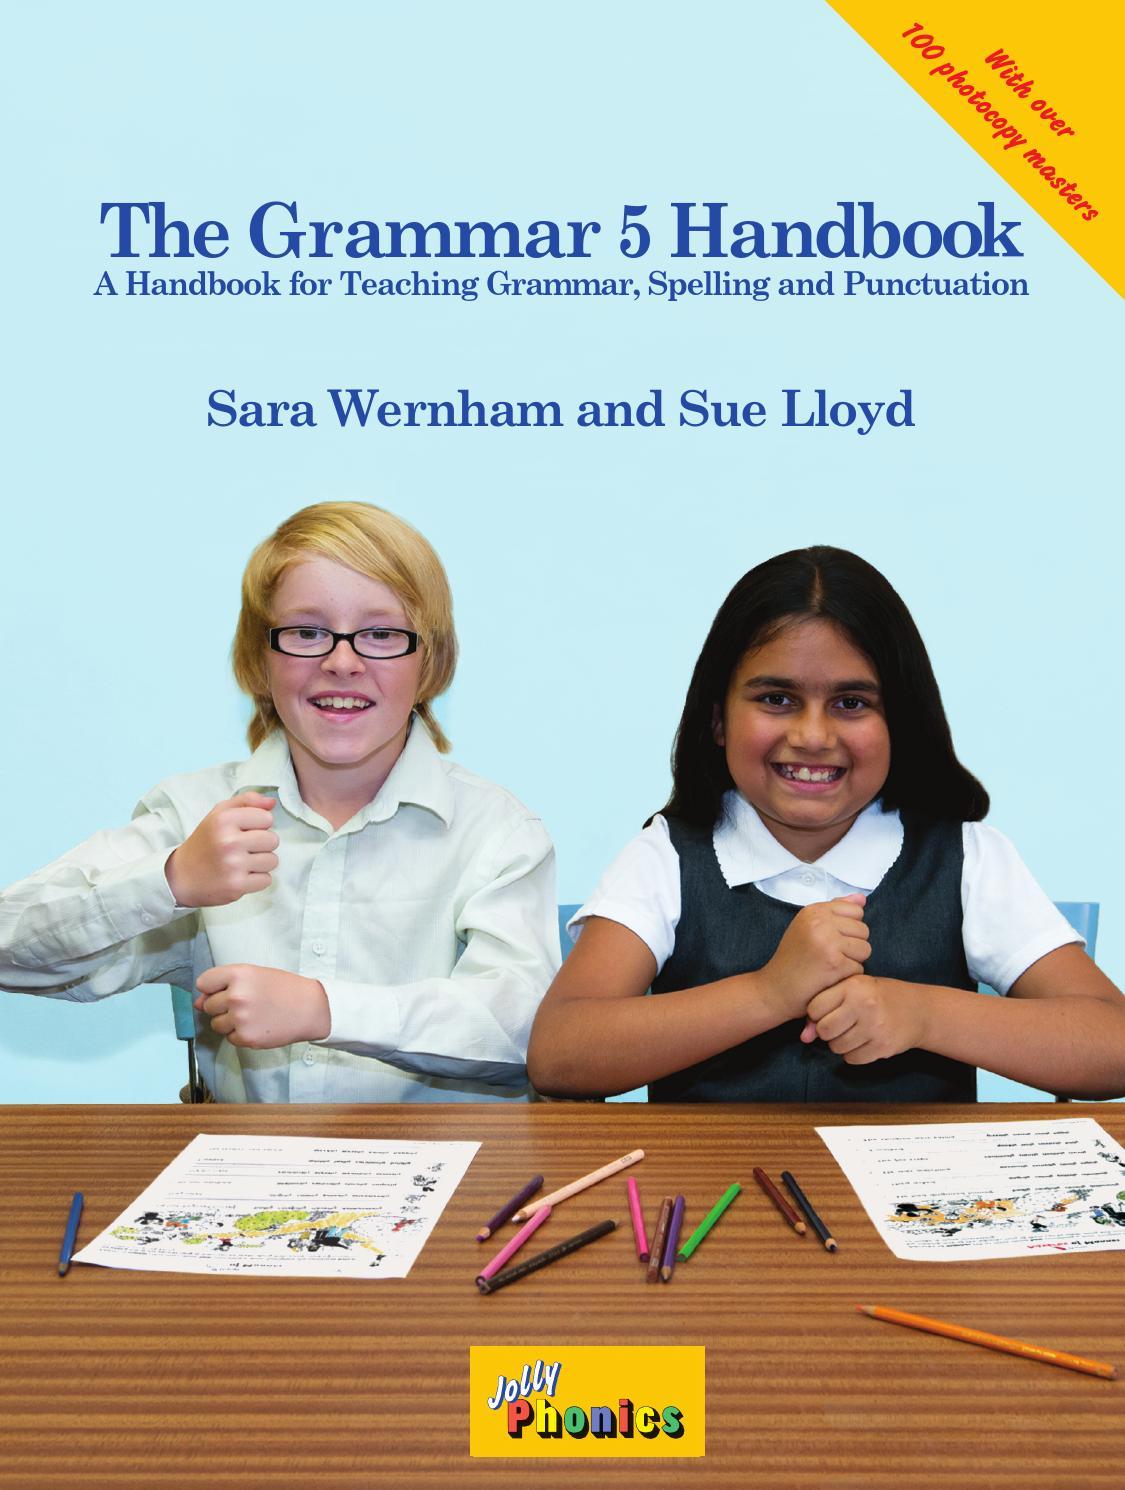 jolly grammar handbook 3 pdf download